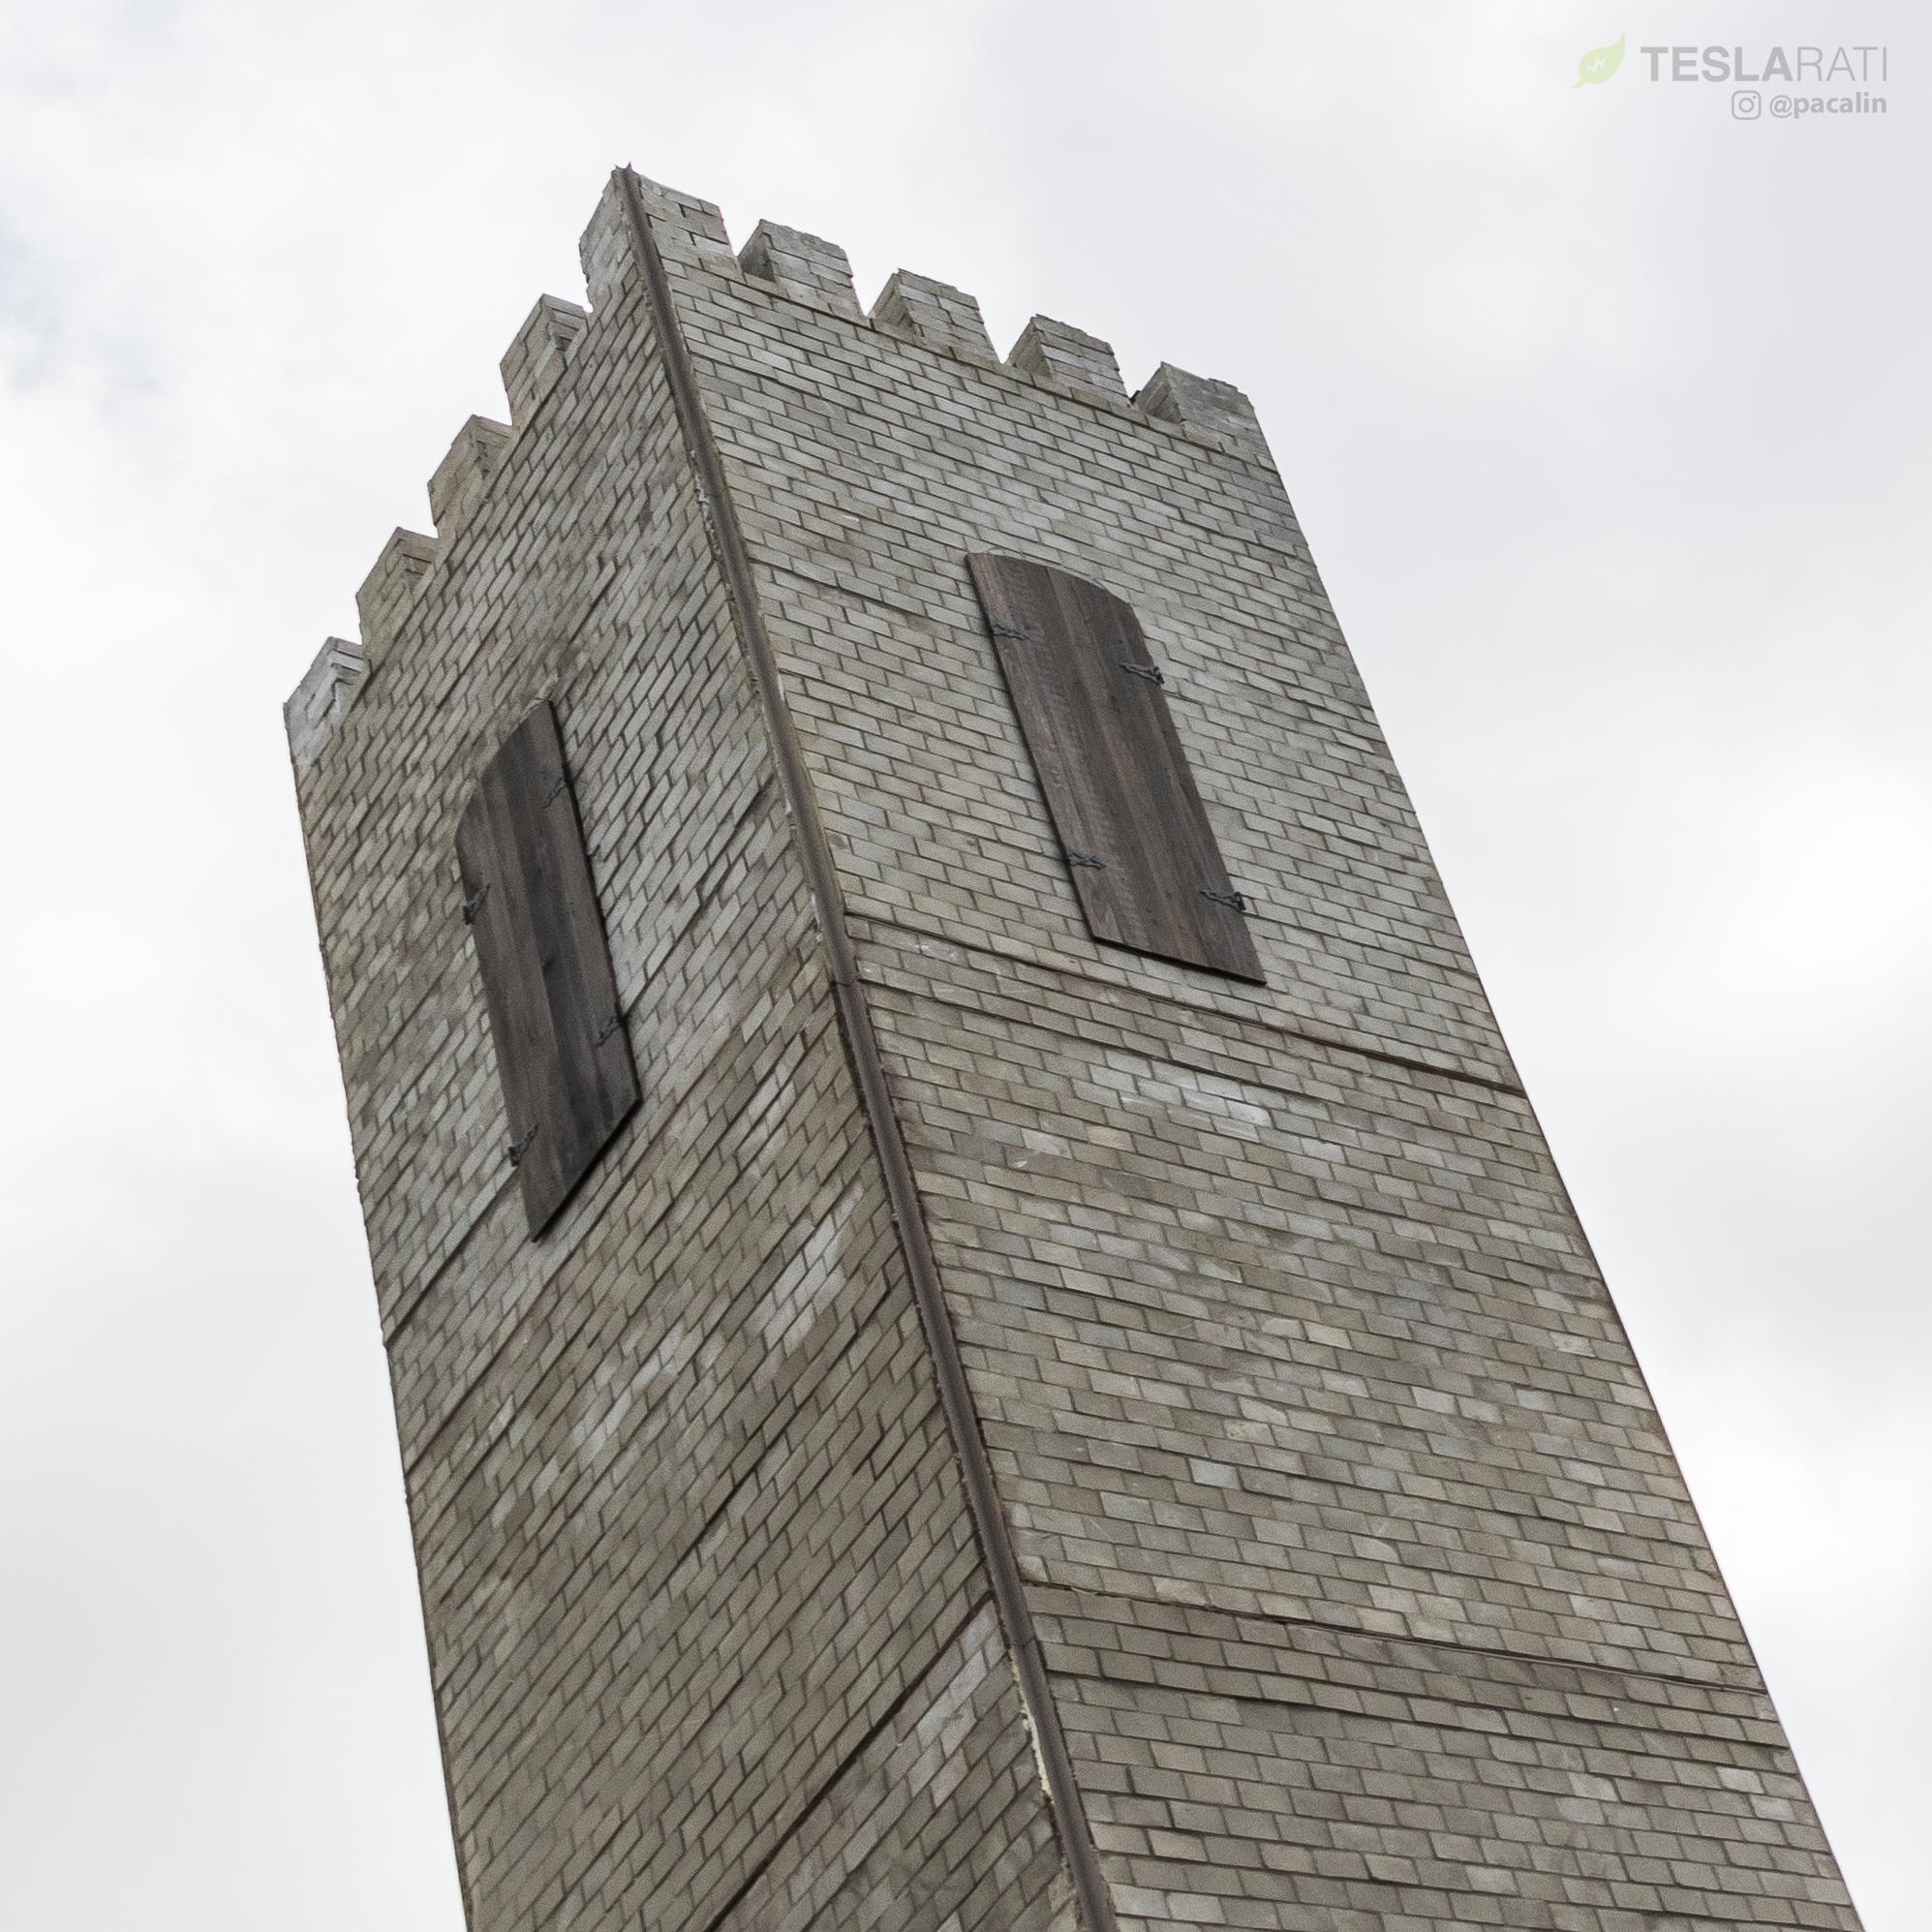 TBC-watchtower-complete-Pauline-Acalin-12172018-7